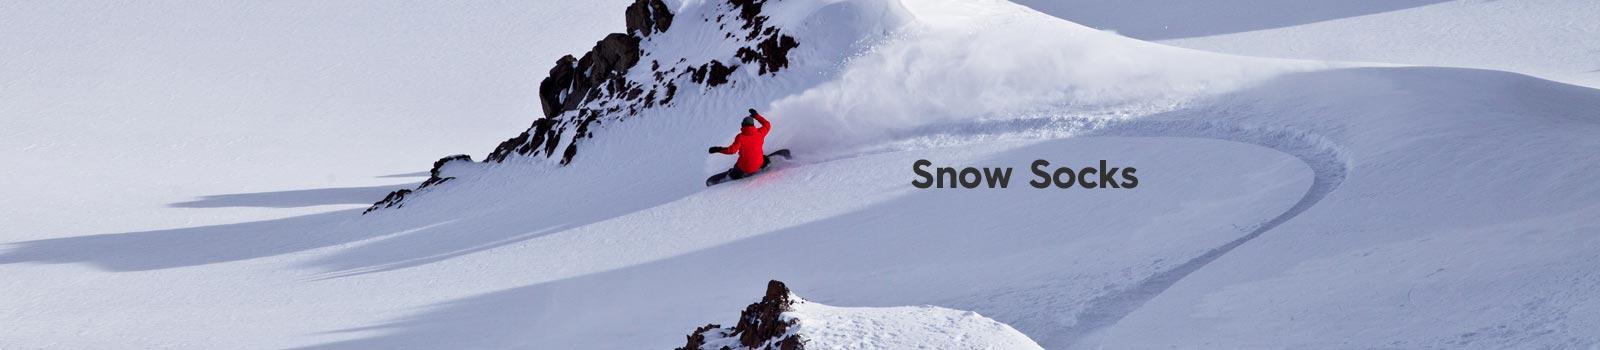 Quiksilver Mens Snow Shop - Snow Socks